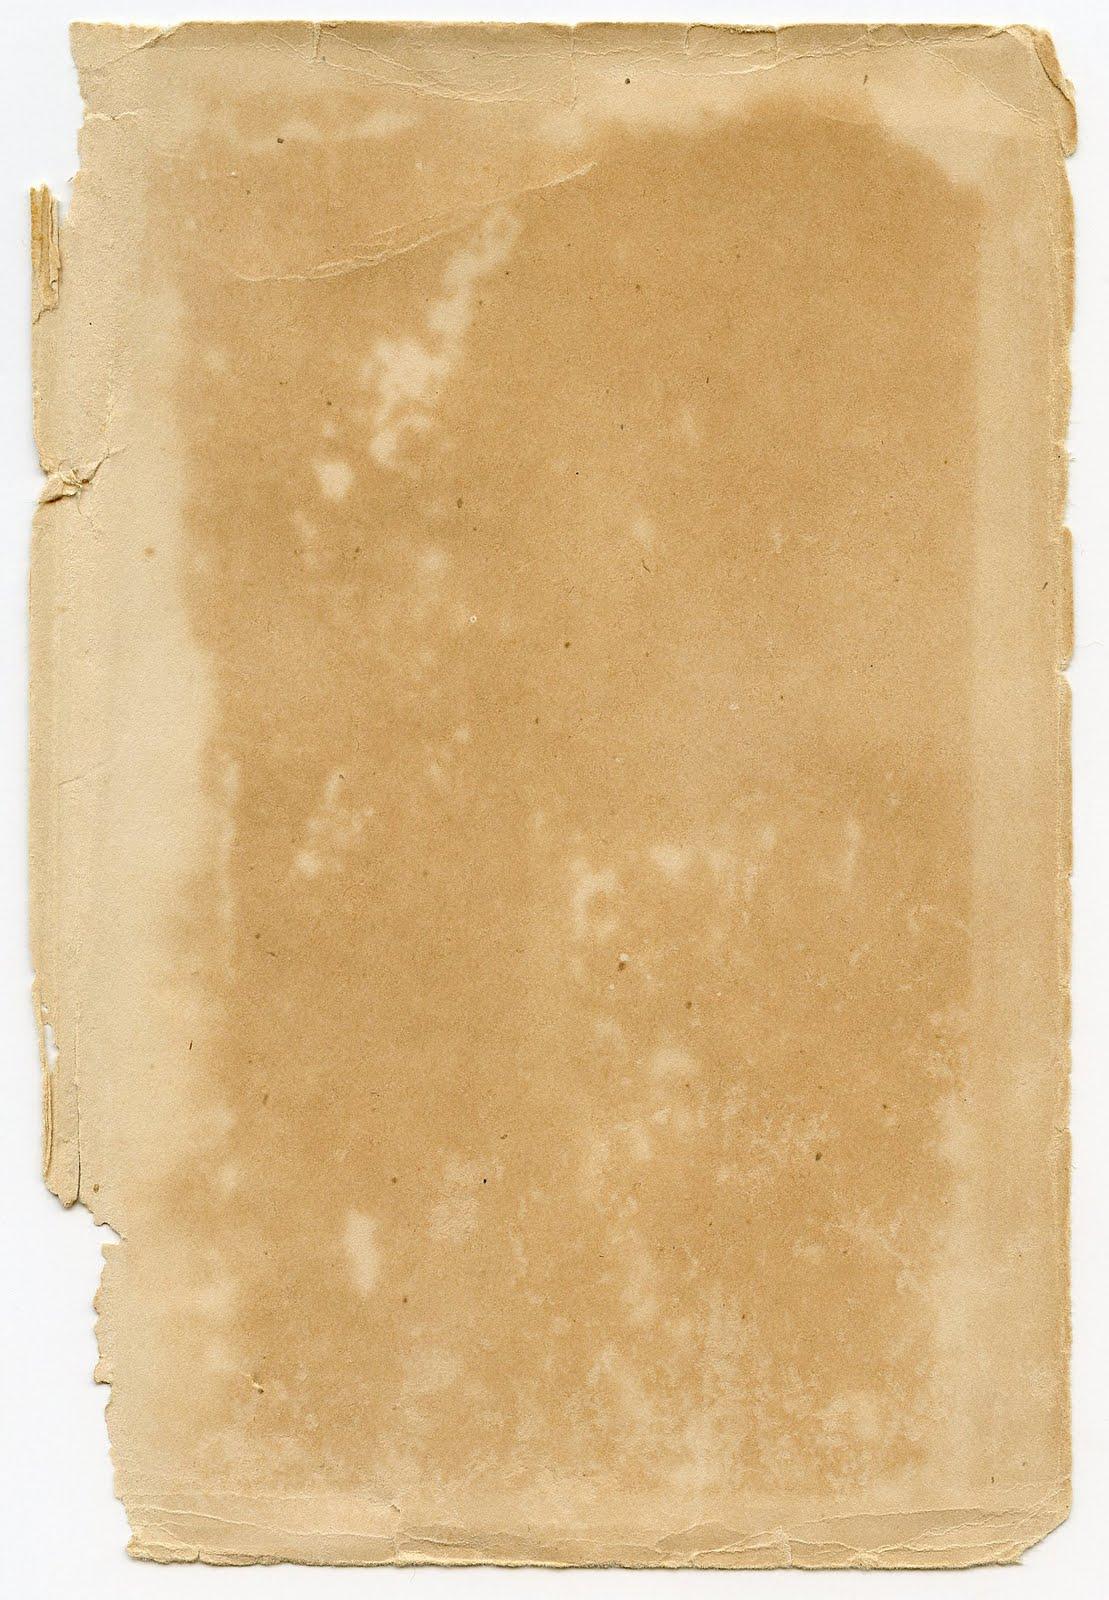 Antique Ephemera - Torn Paper Texture - The Graphics Fairy